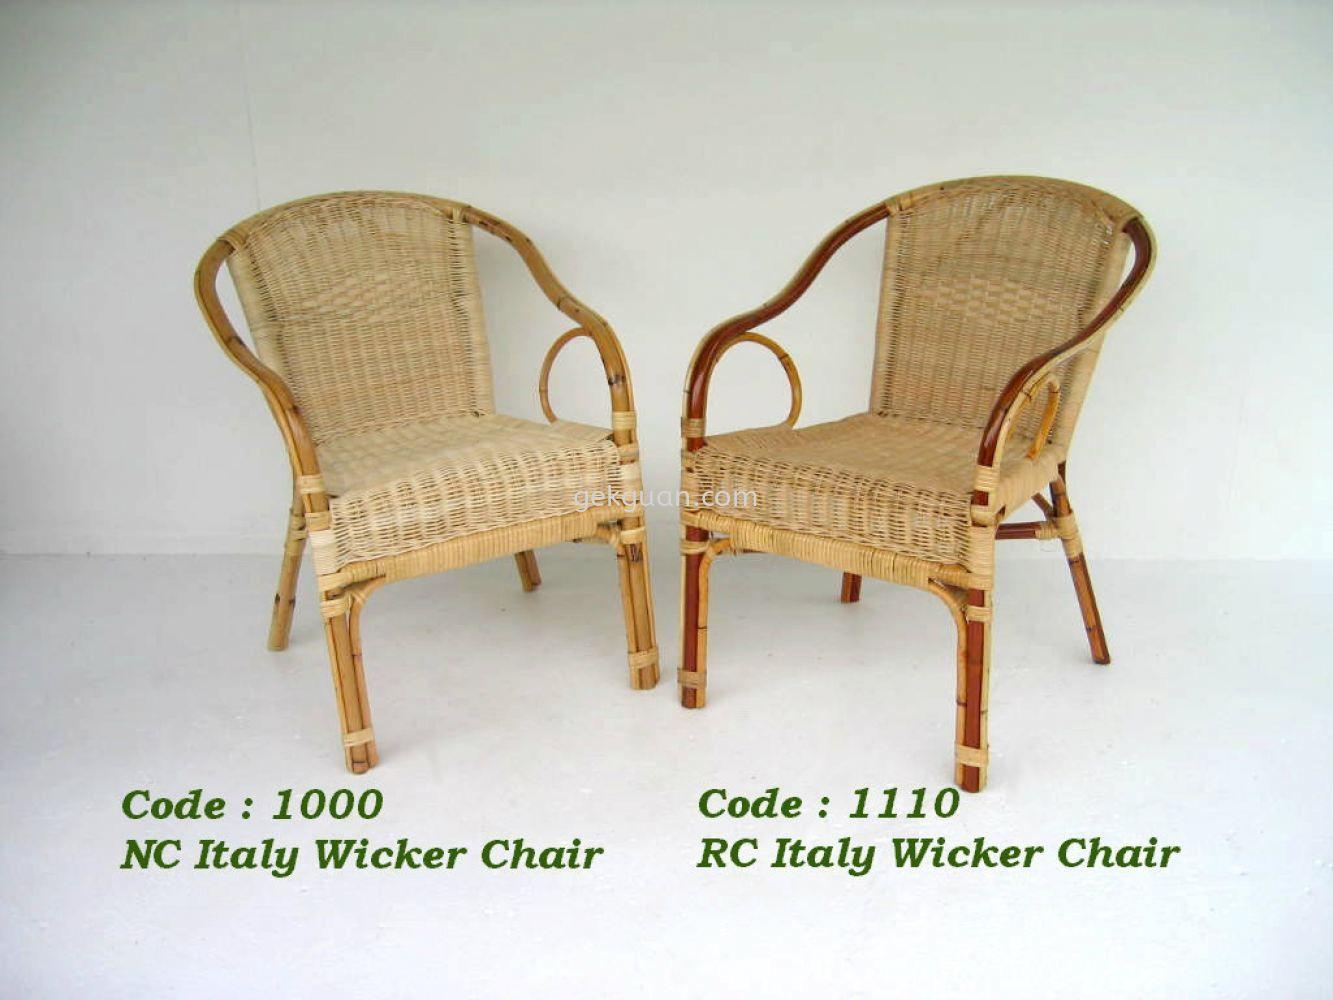 RF 013   曼丹骨子椅 RF 014   红藤骨子椅 Rattan / Bamboo Chair Rattan / Bamboo /  Wooden Furniture Johor, Muar, Kuala Lumpur, KL, Melaka.